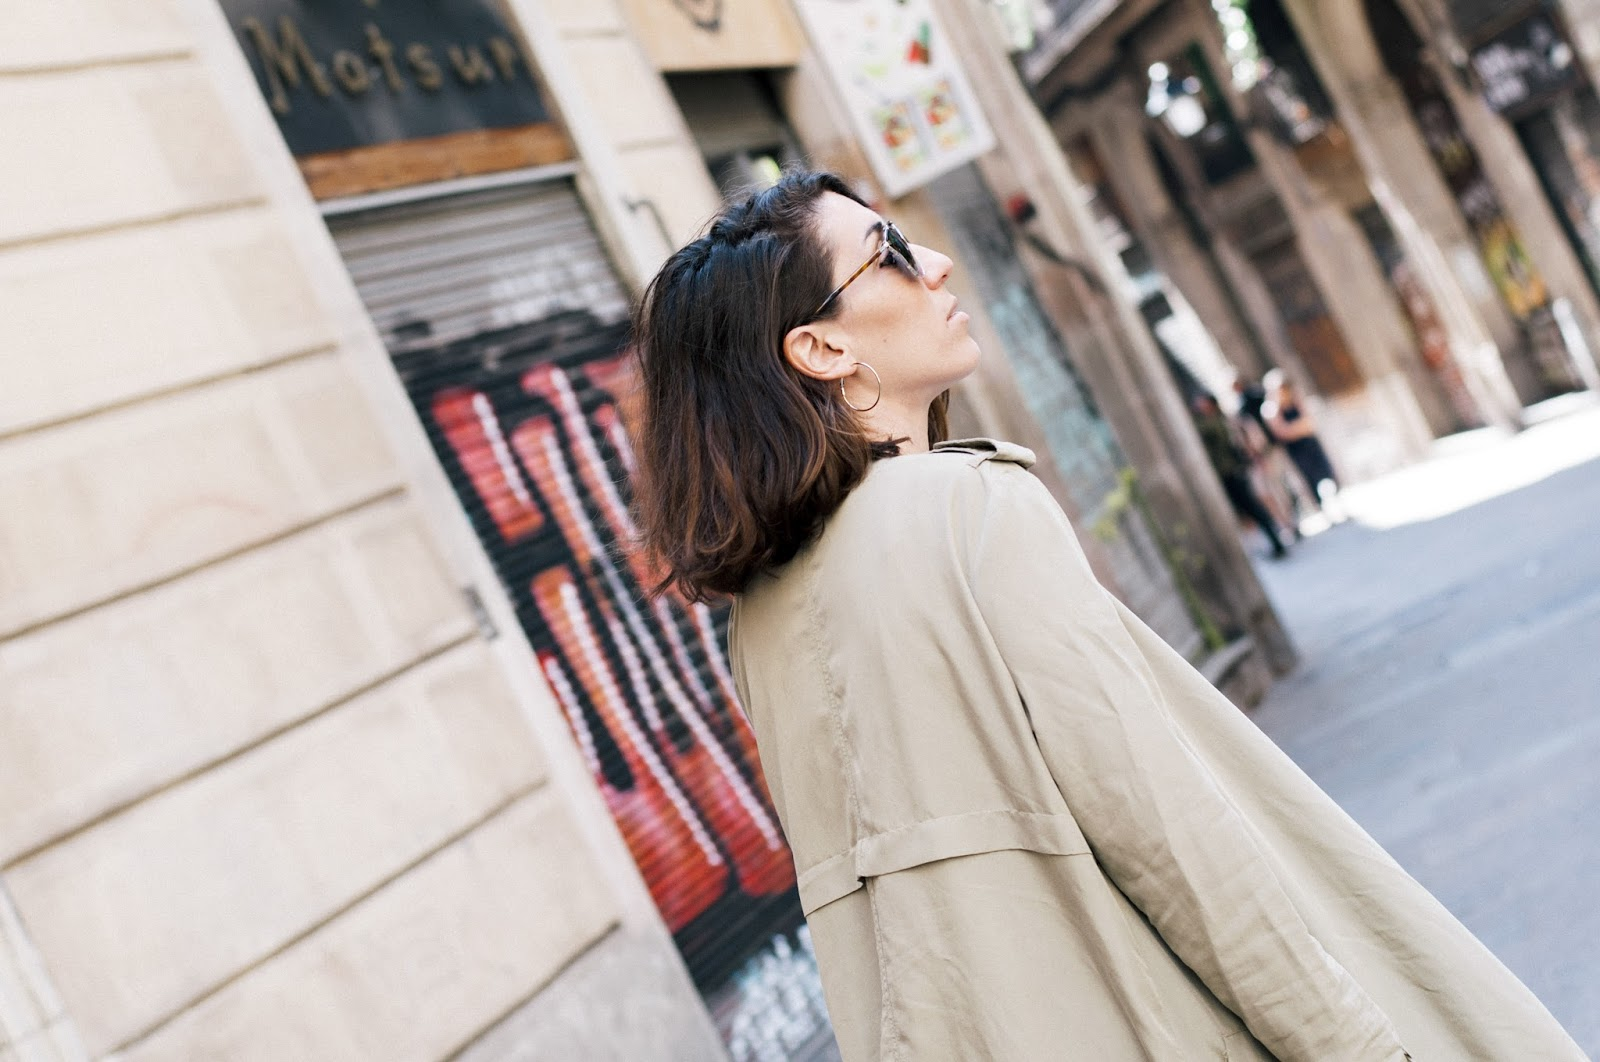 Falda metálica Zara, Camiseta Mango, Gabardina Bershka, Sandalias Asos